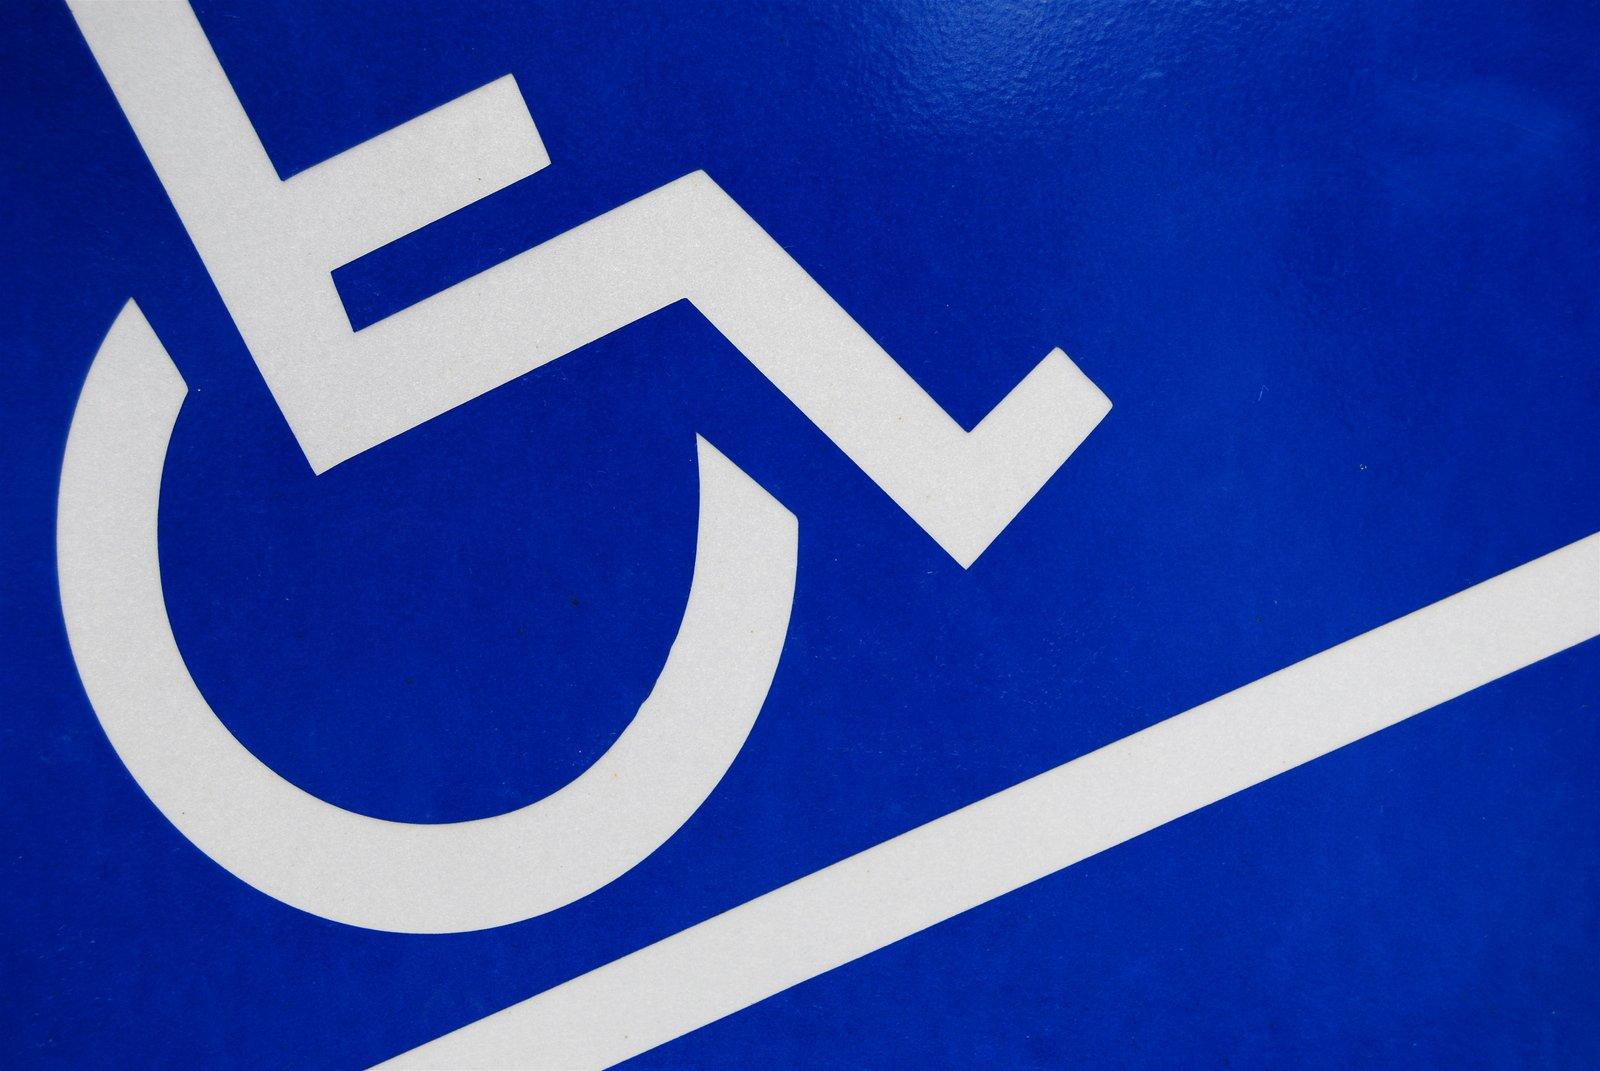 handicap 1 0